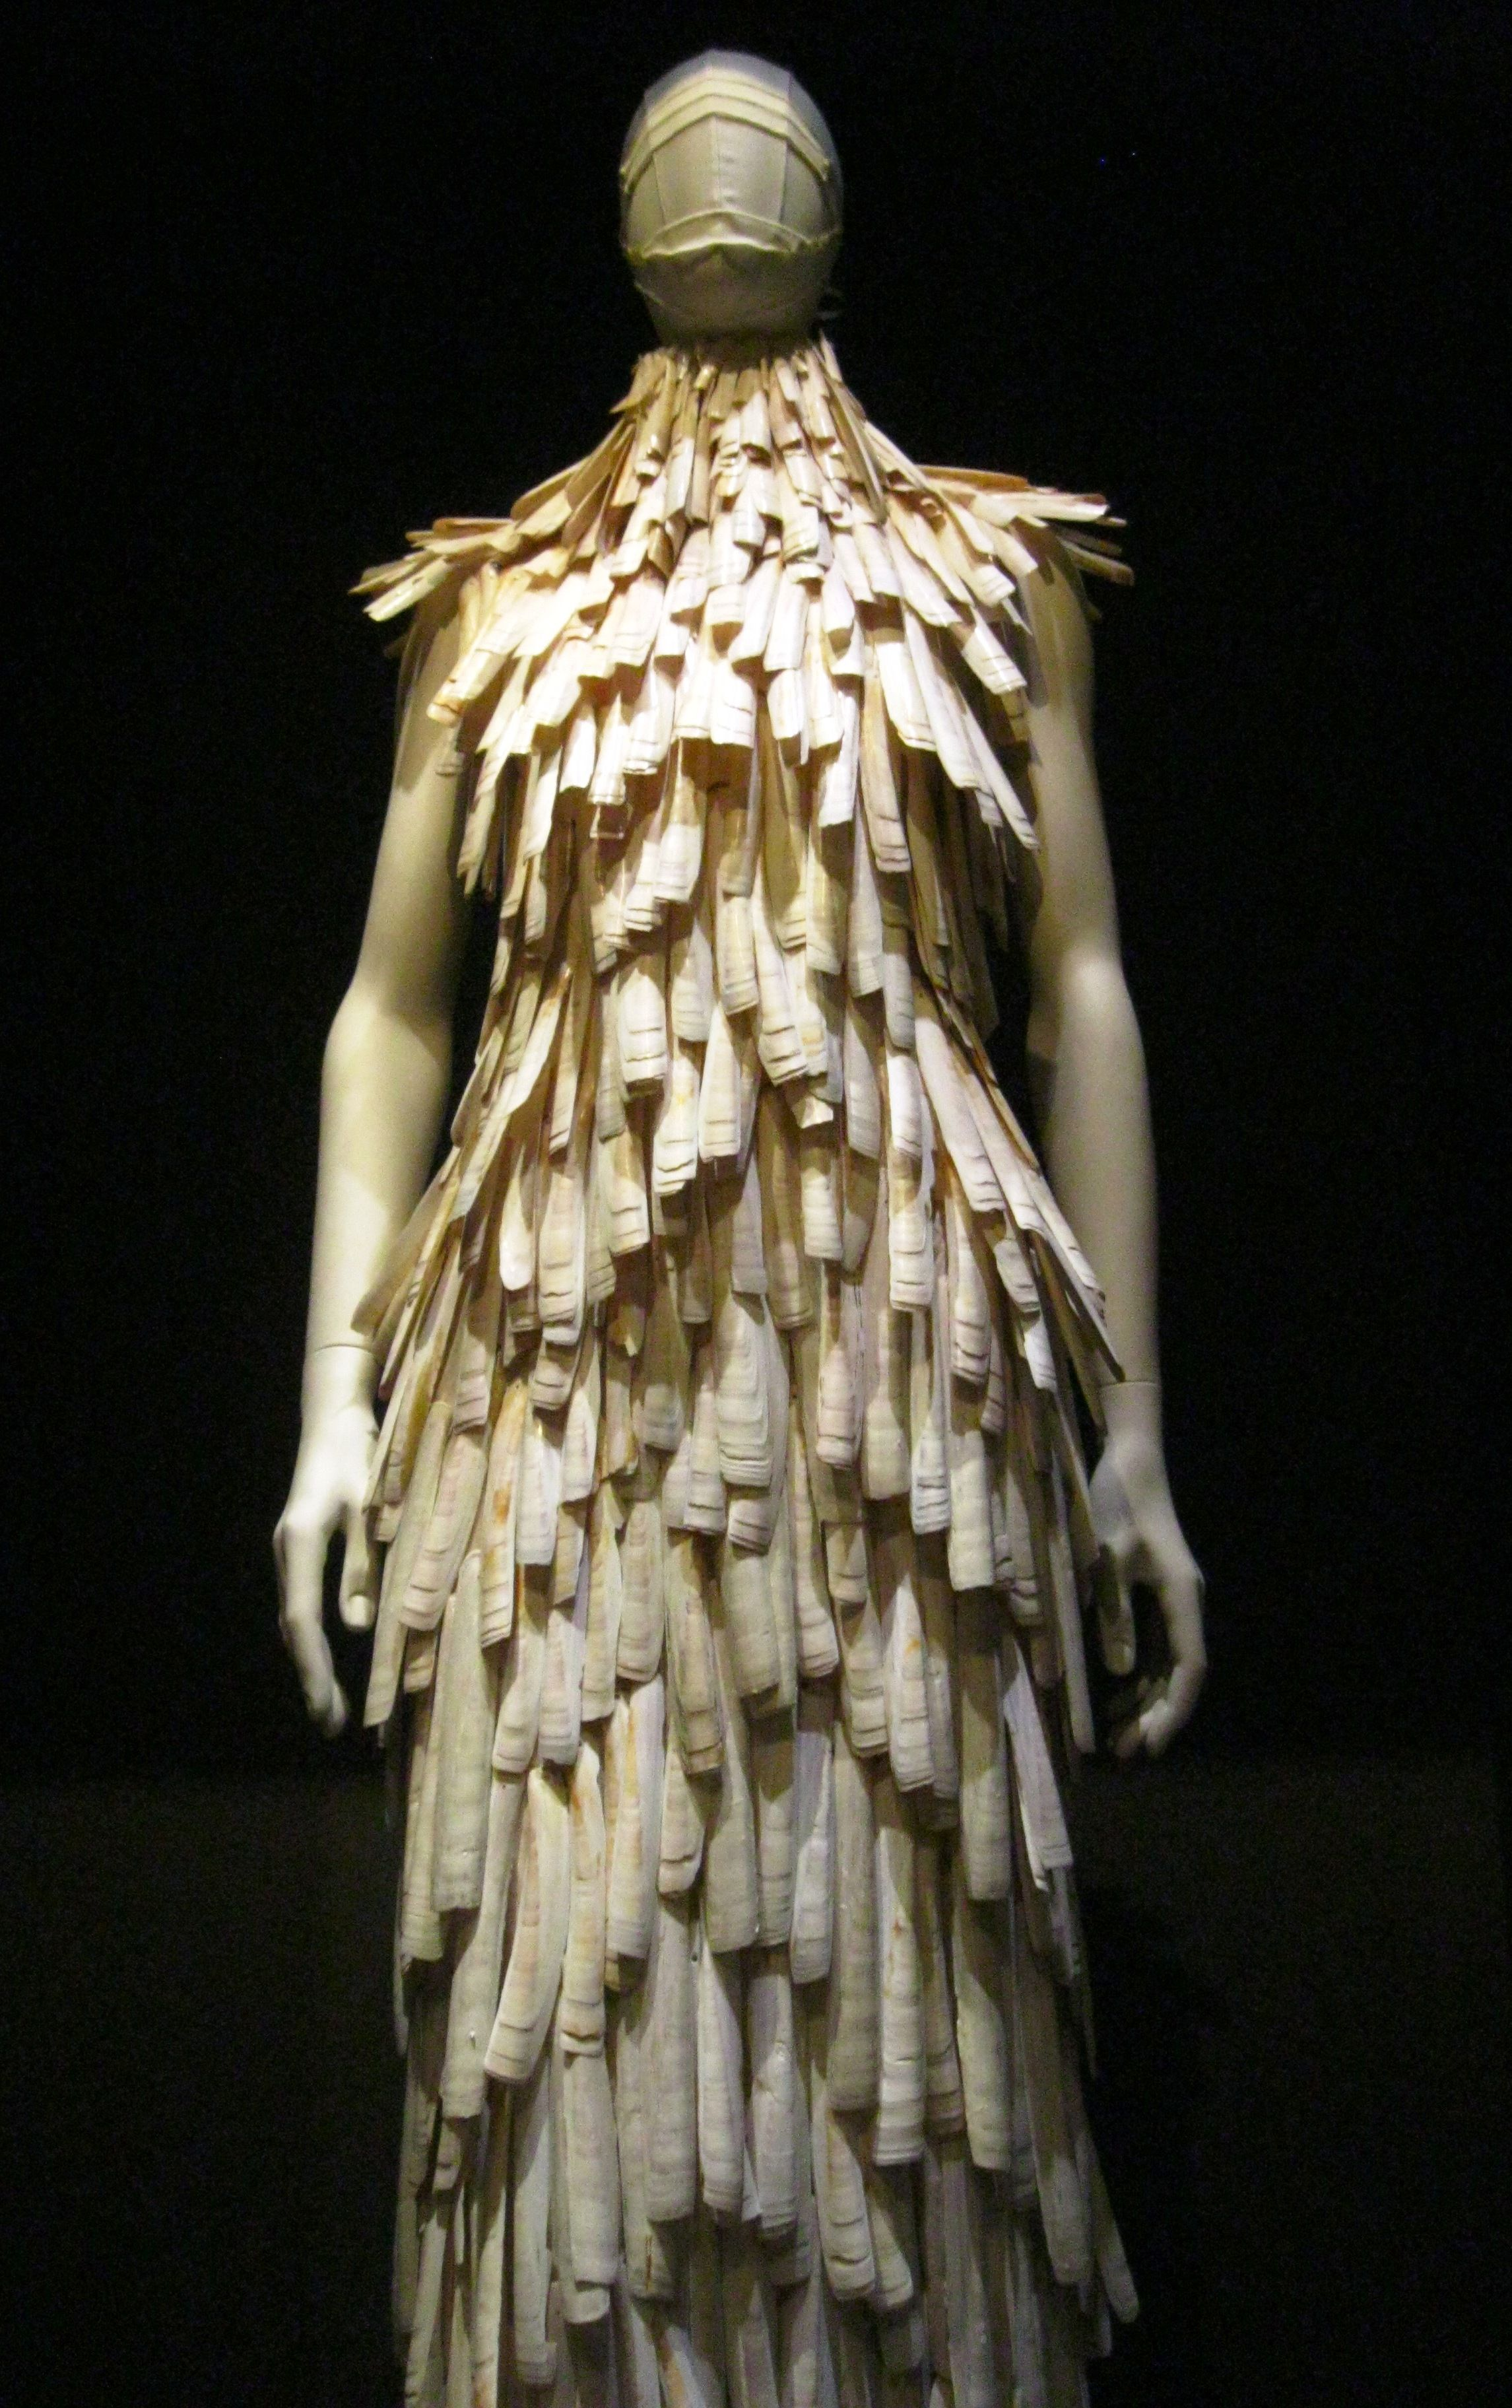 mcqueen-savage-beauty-razor-shell-dress.jpg (18×18